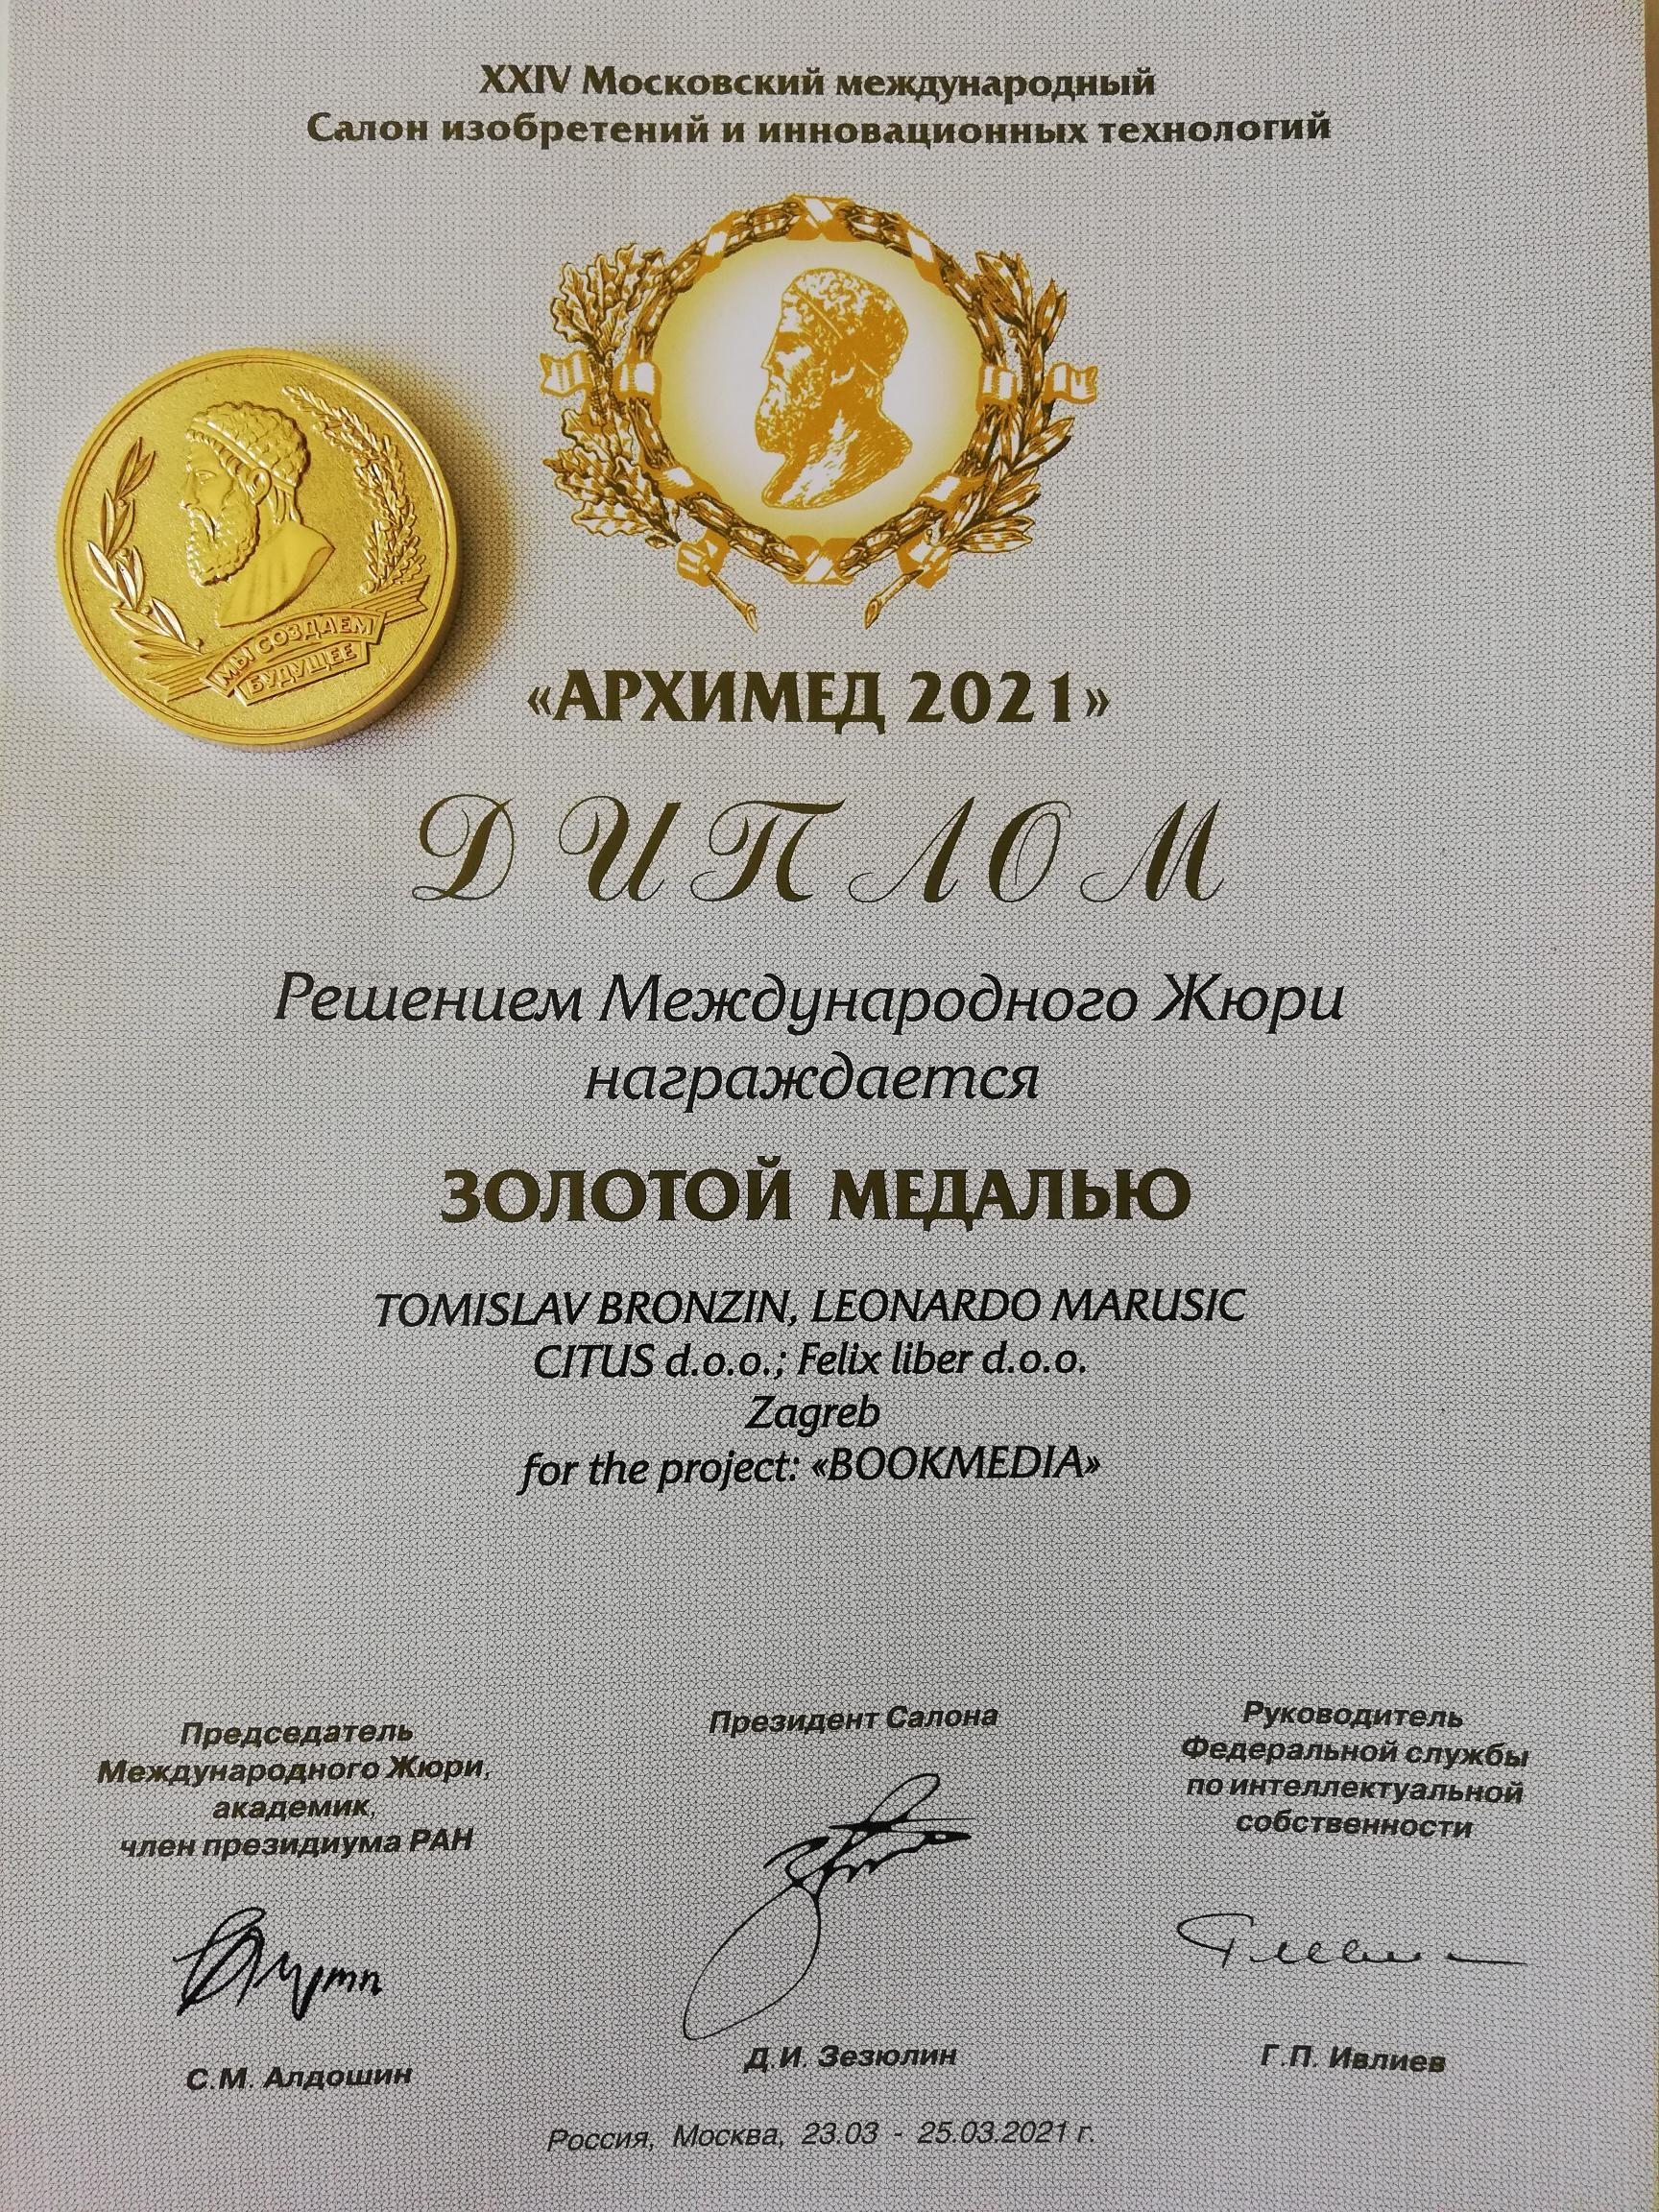 Archimedes 2021 - Gold Medal for Innovation BookMedia